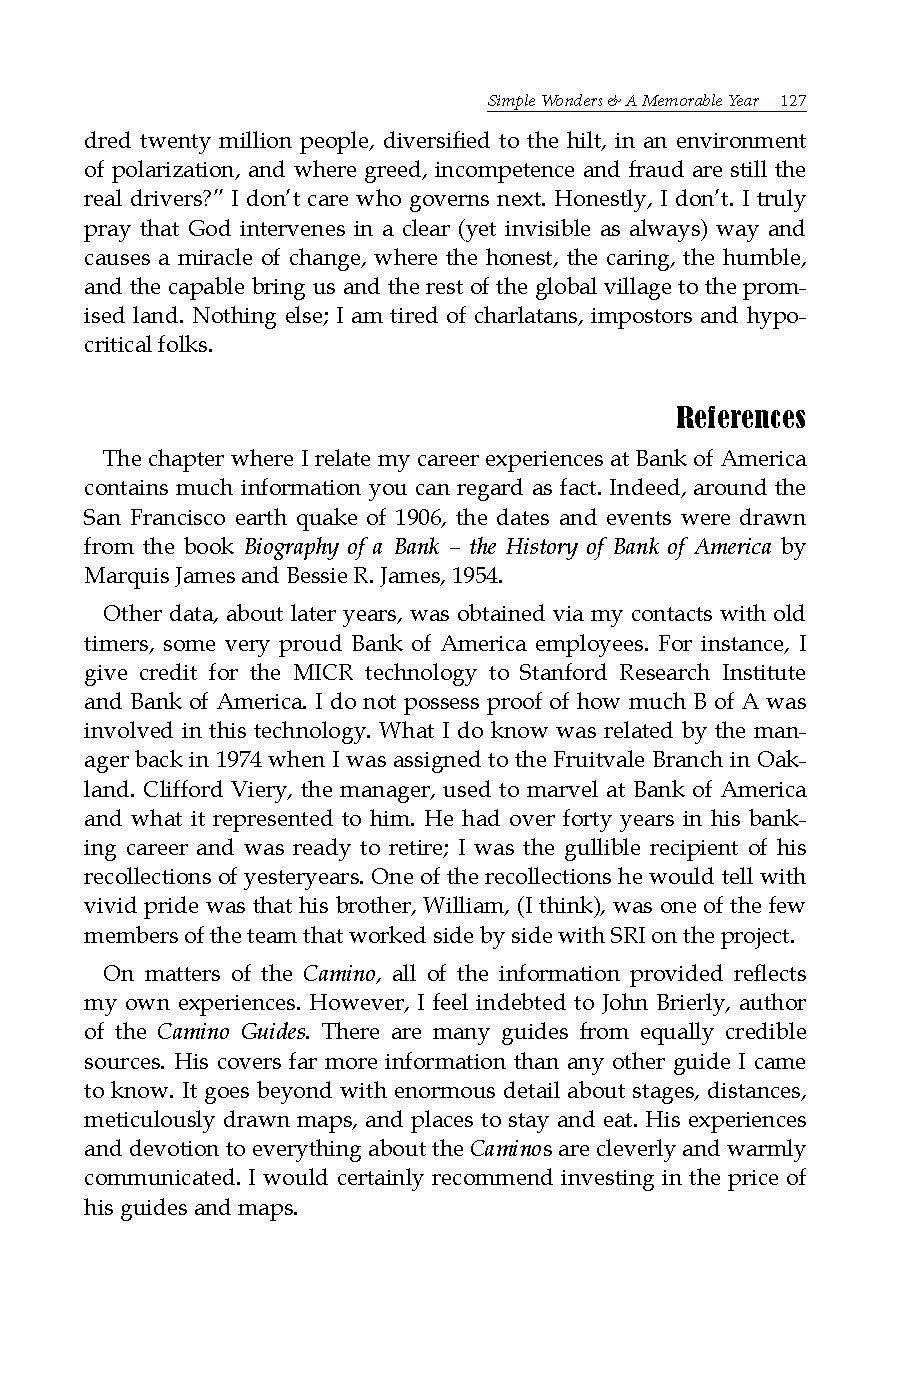 binder6_page_14.jpg